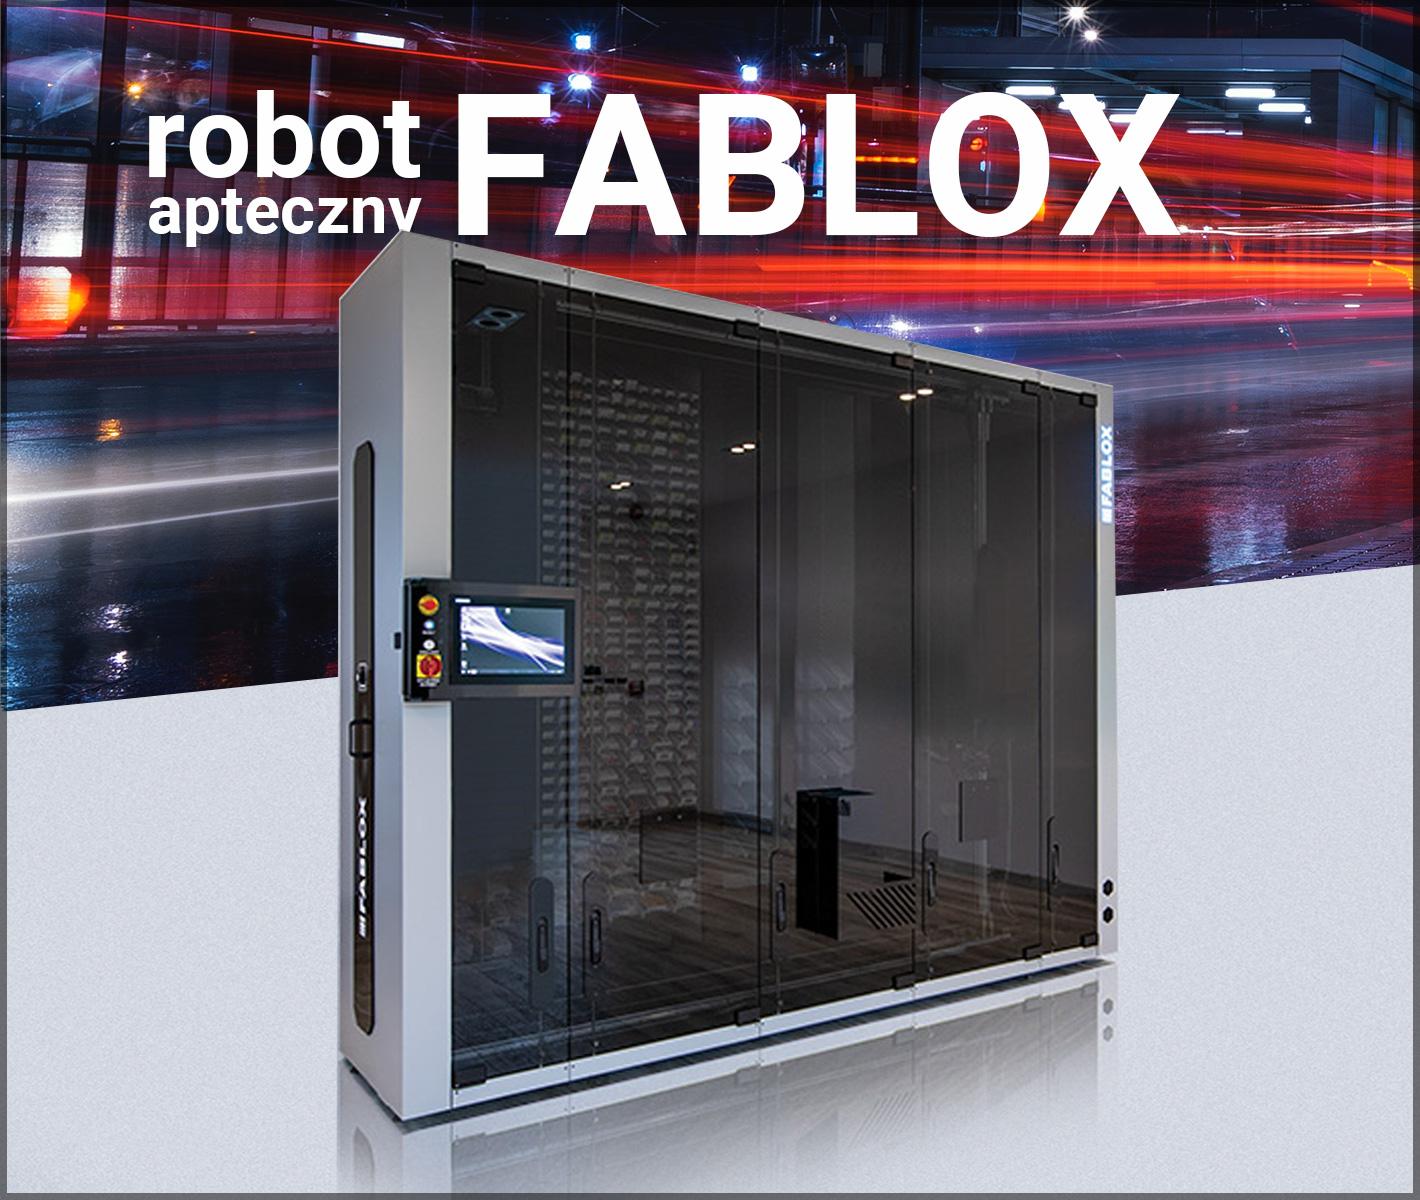 Robot apteczny FABLOX